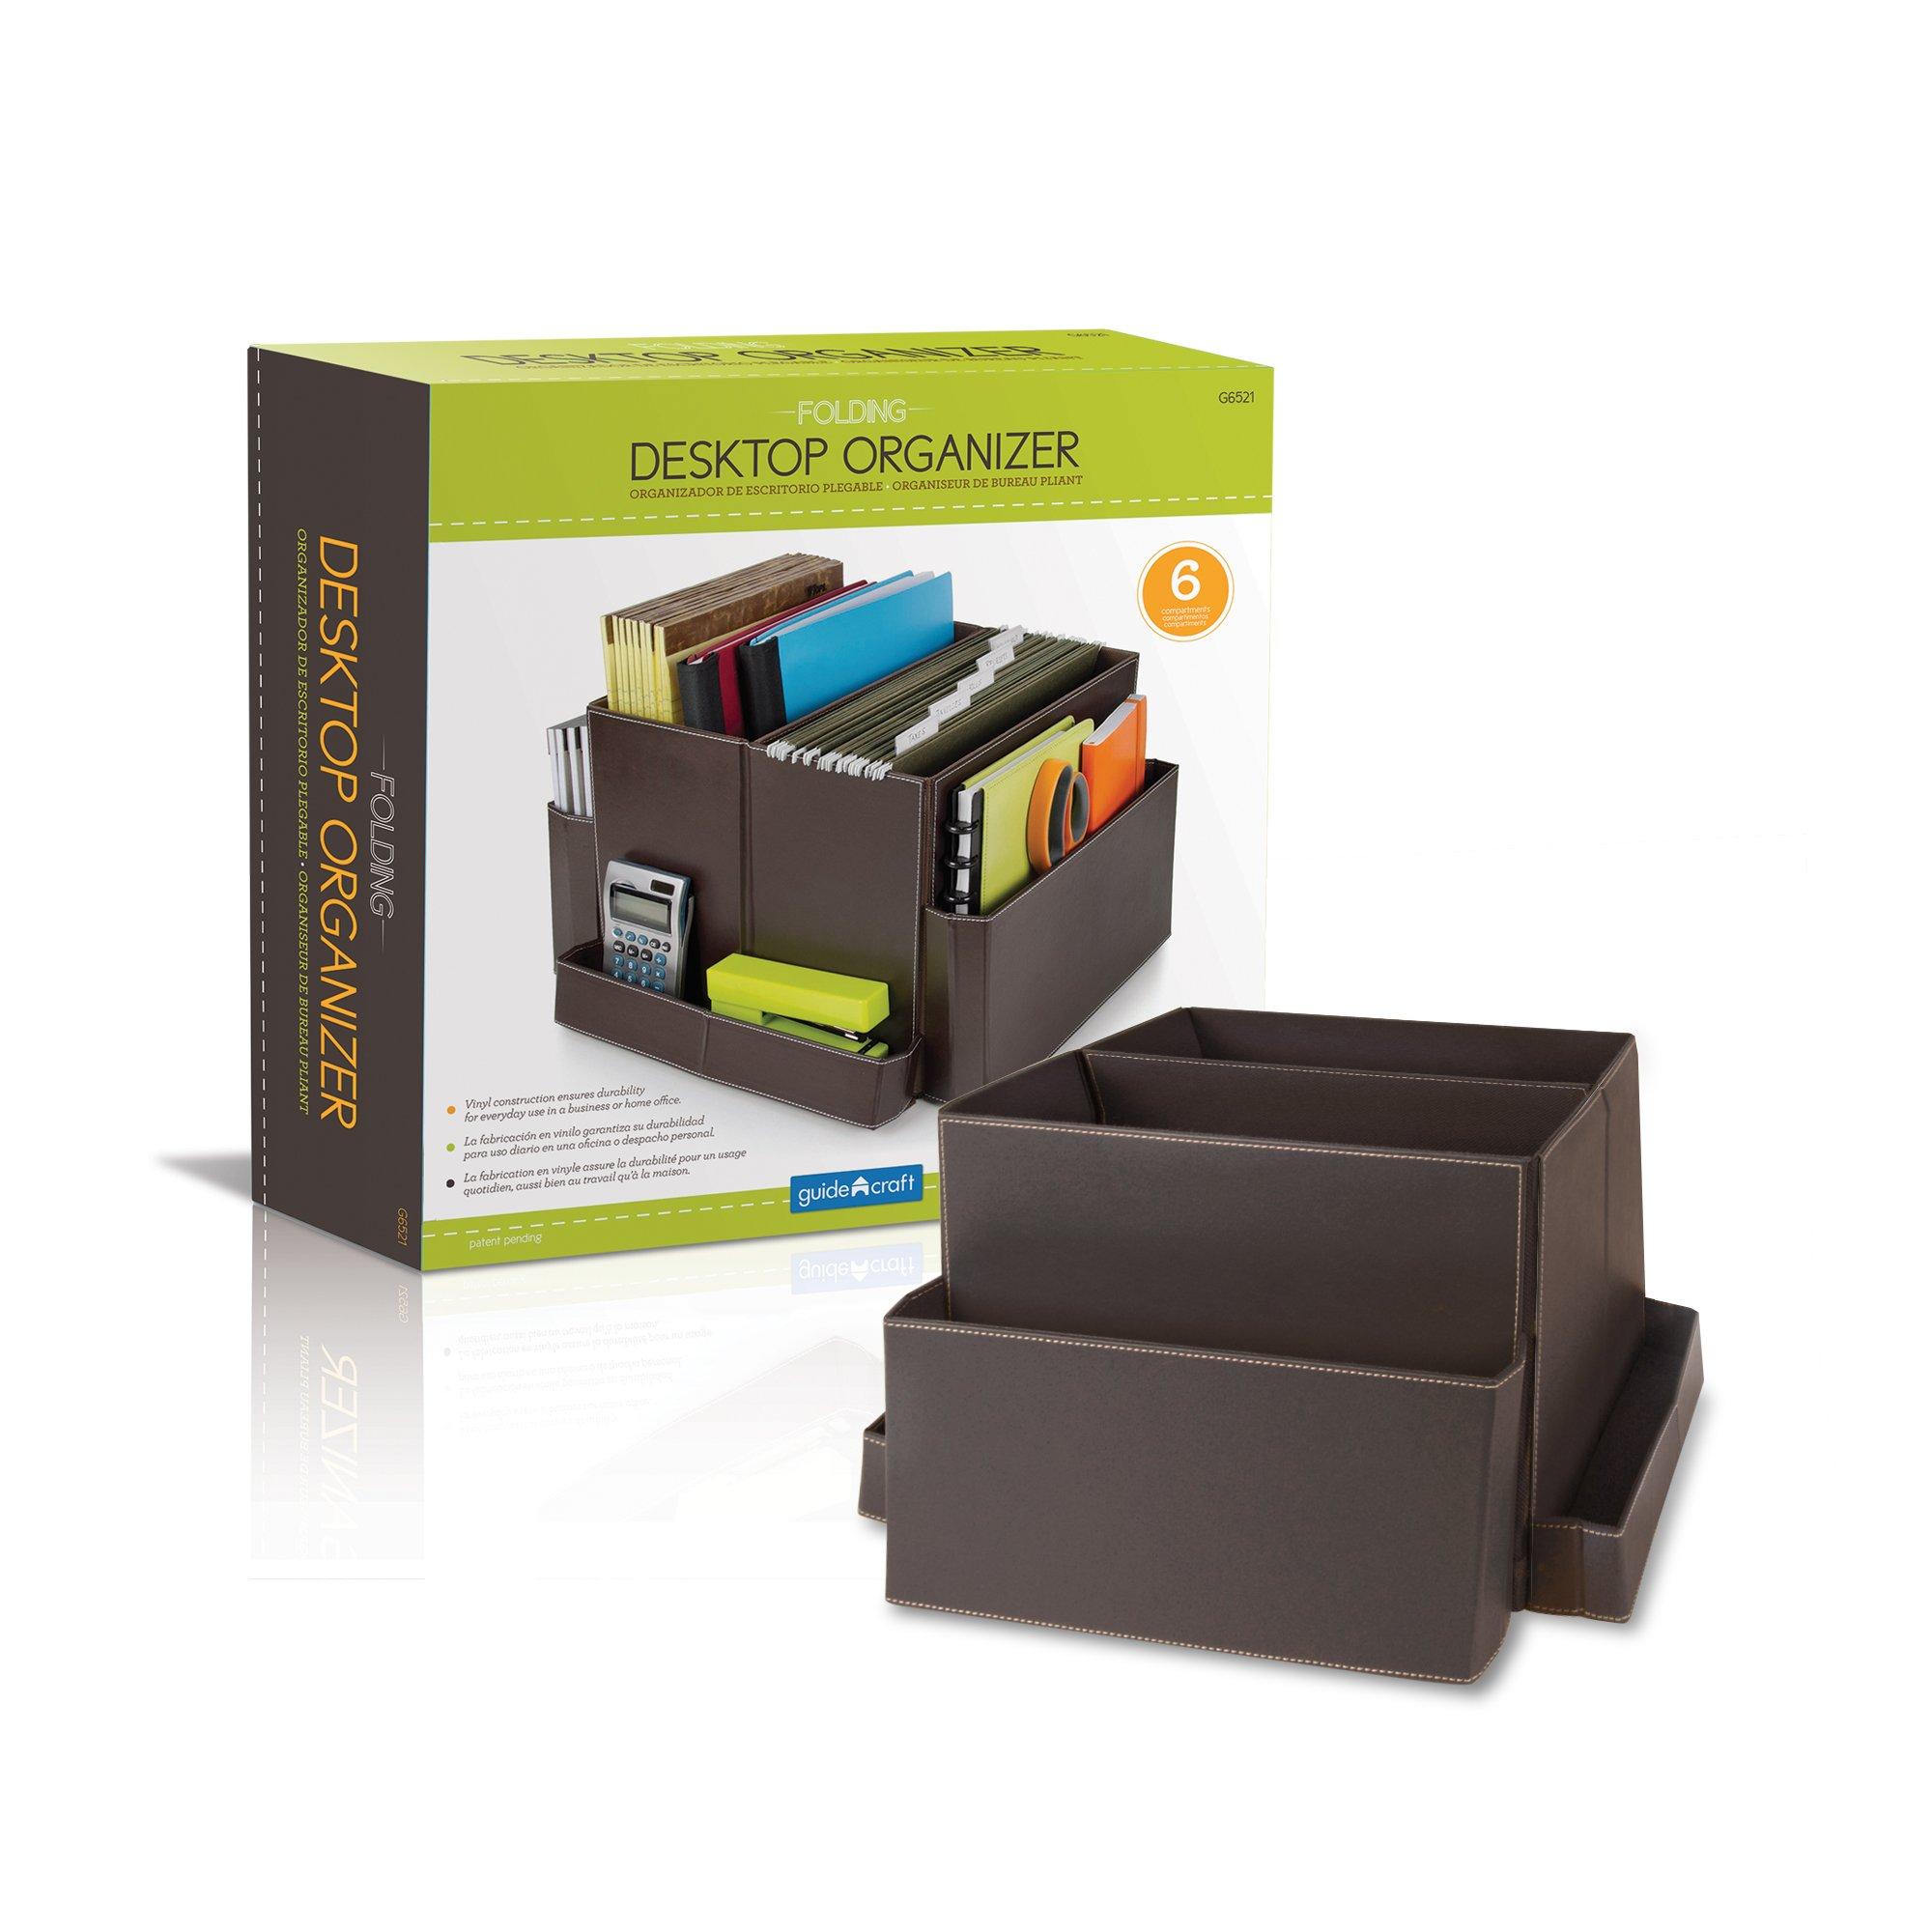 Guidecraft Folding Desk Organizer Office School Supply Brown - 6 Storage Compartments